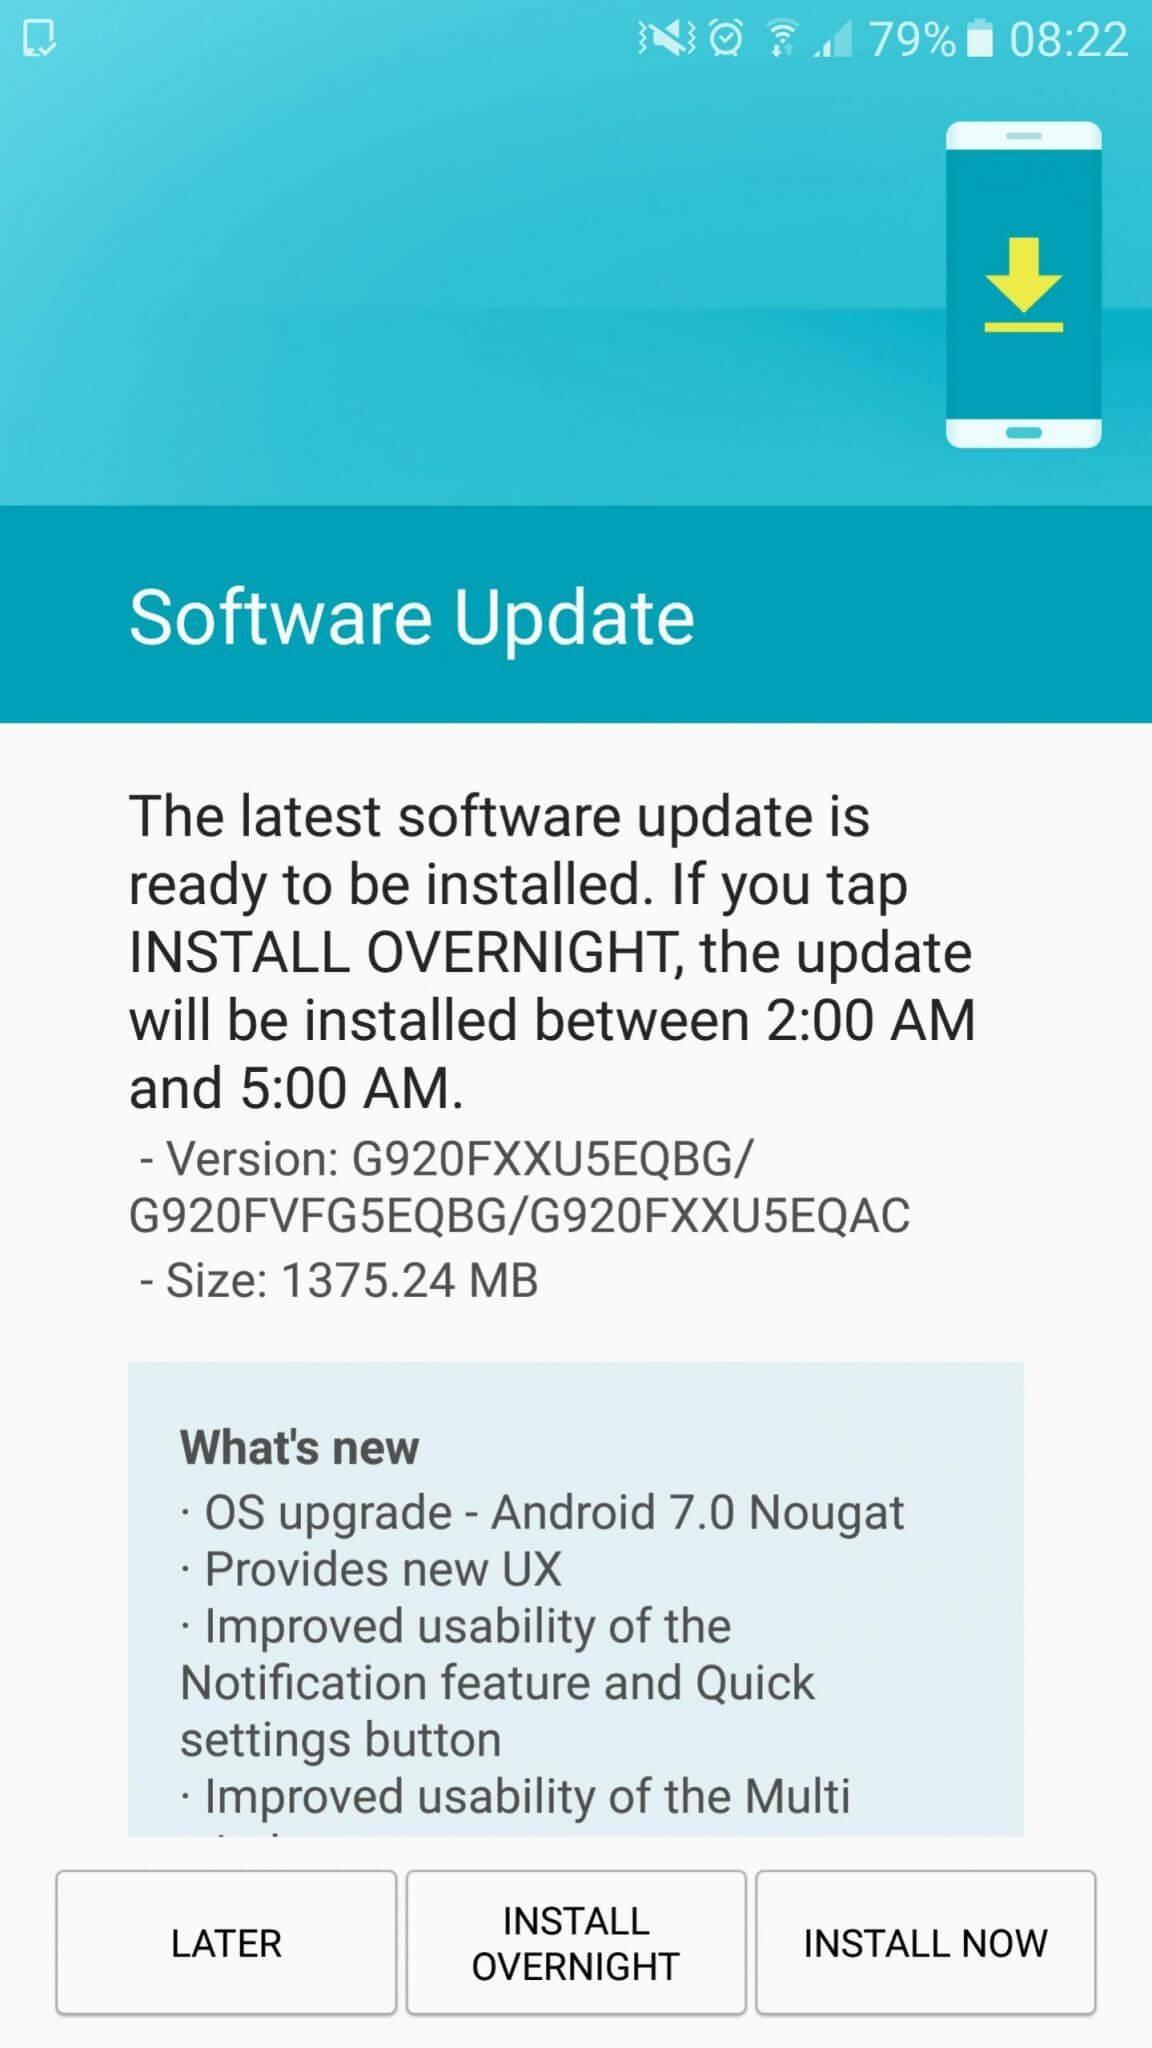 Android Nougat para Galaxy S6 - Samsung começa a liberar Android Nougat para Galaxy S6 e S6 Edge